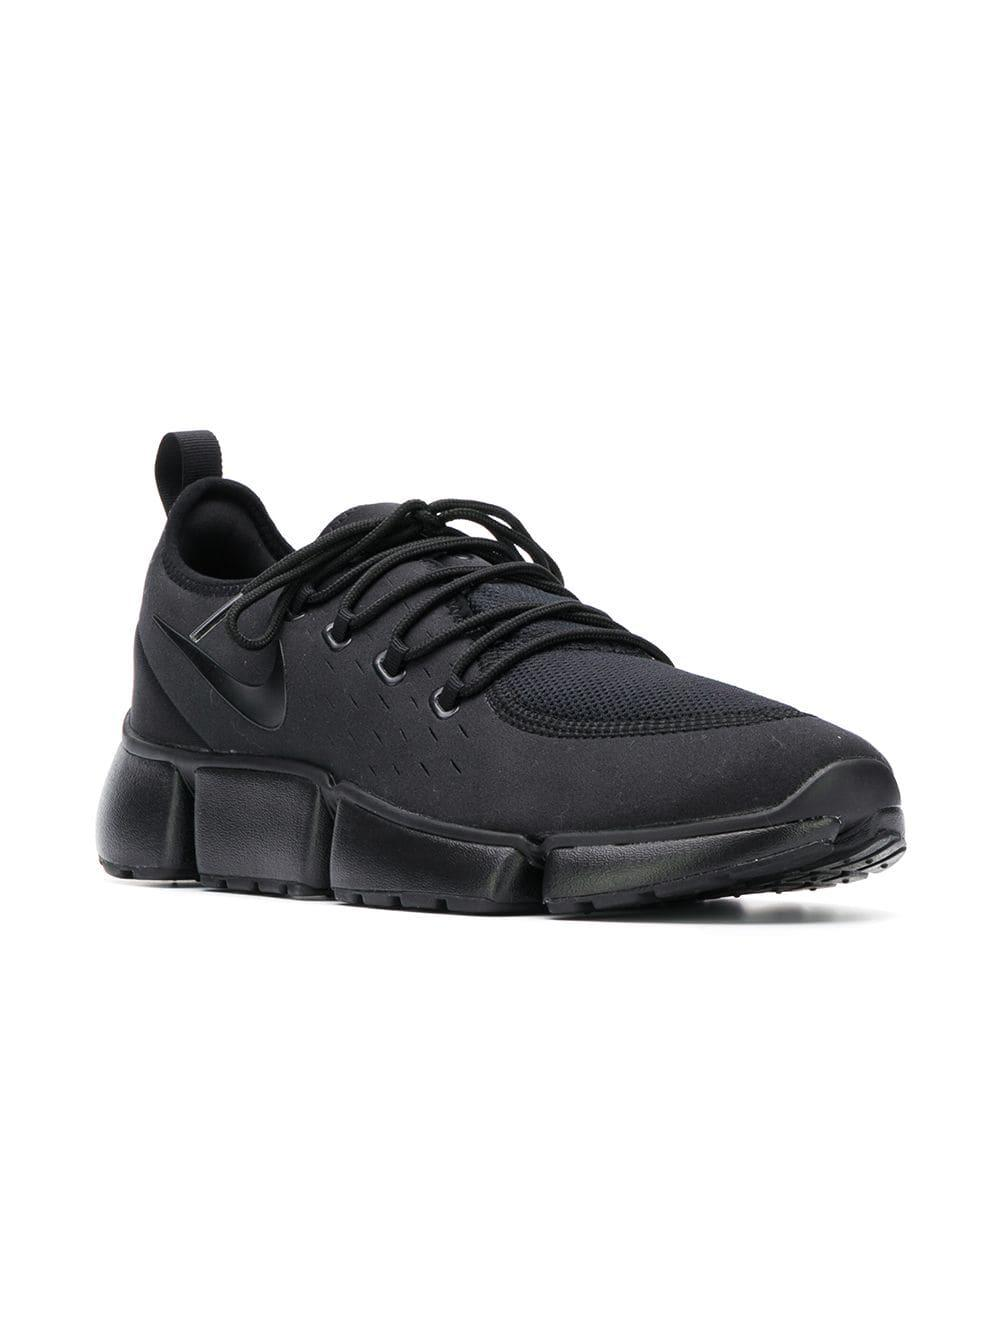 on sale ea331 381ae Nike Pocket Fly Dm Sneakers in Black for Men - Lyst